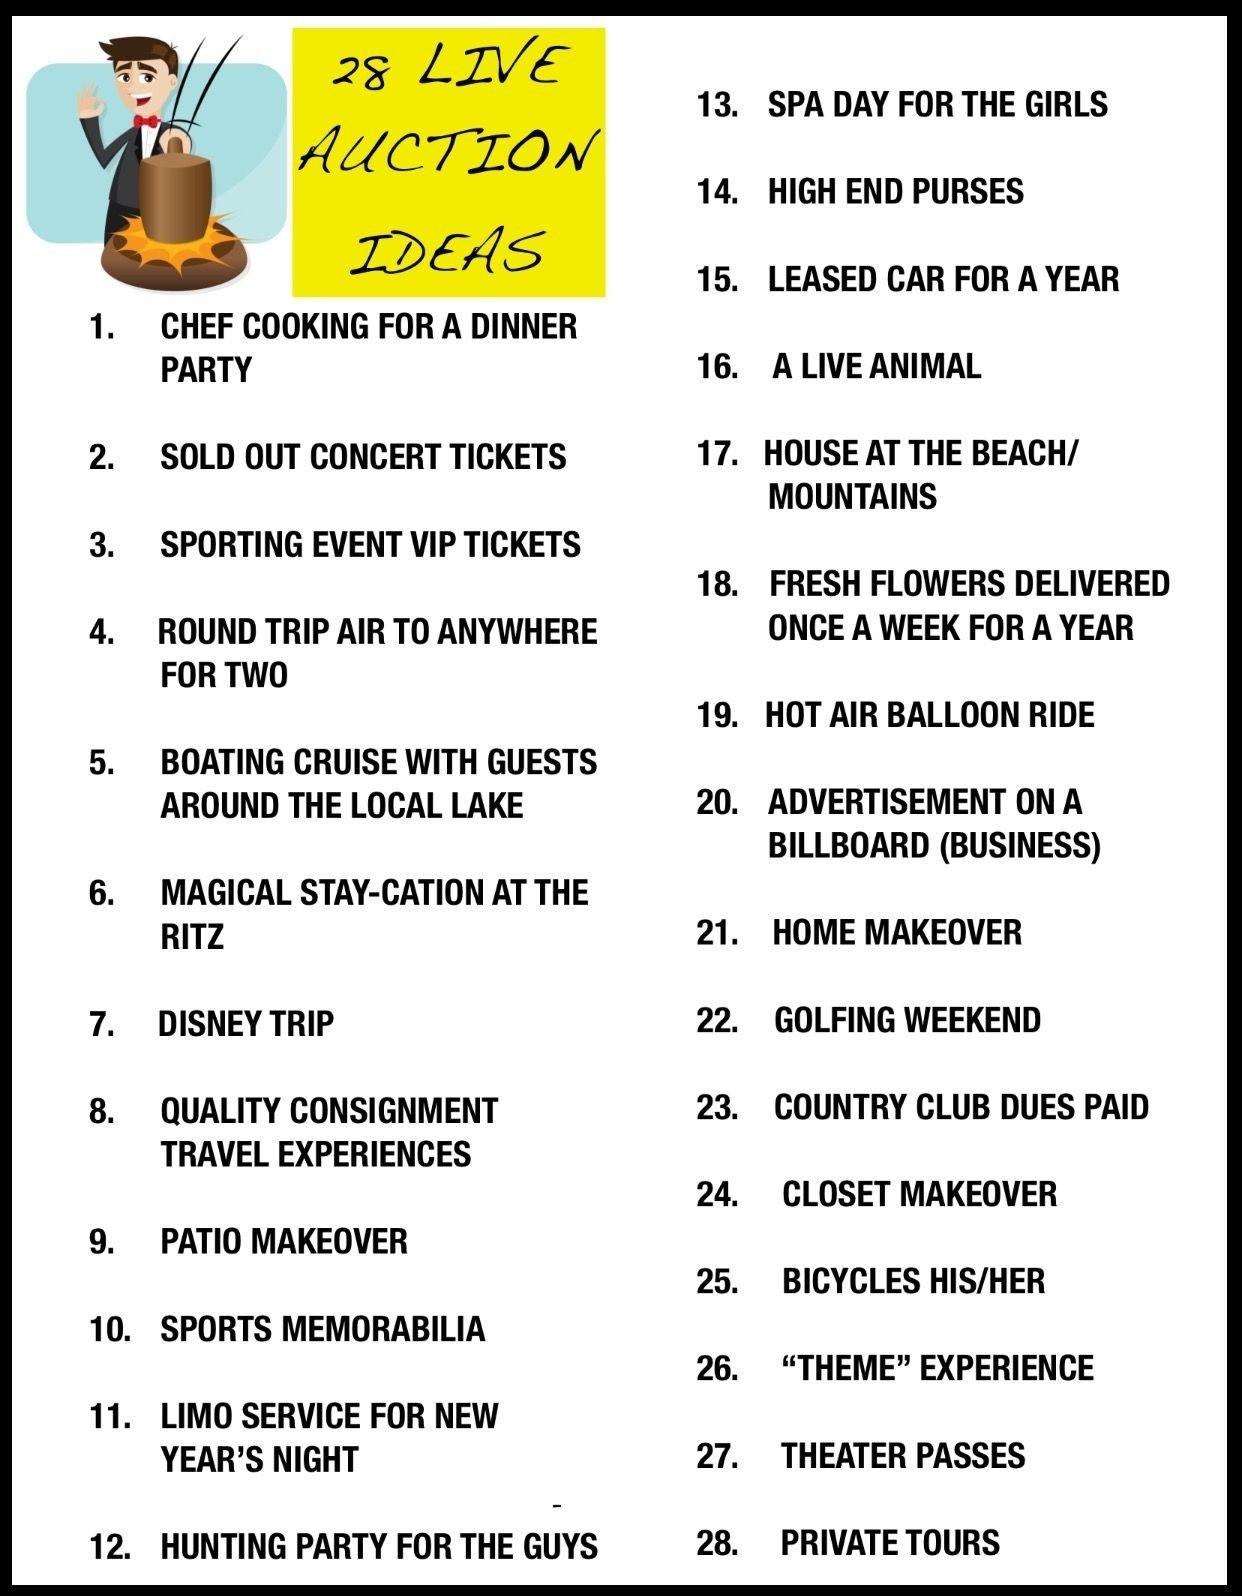 10 Lovable Benefit Ideas To Raise Money live auction ideas for charity events silent auction ideas 1 2020